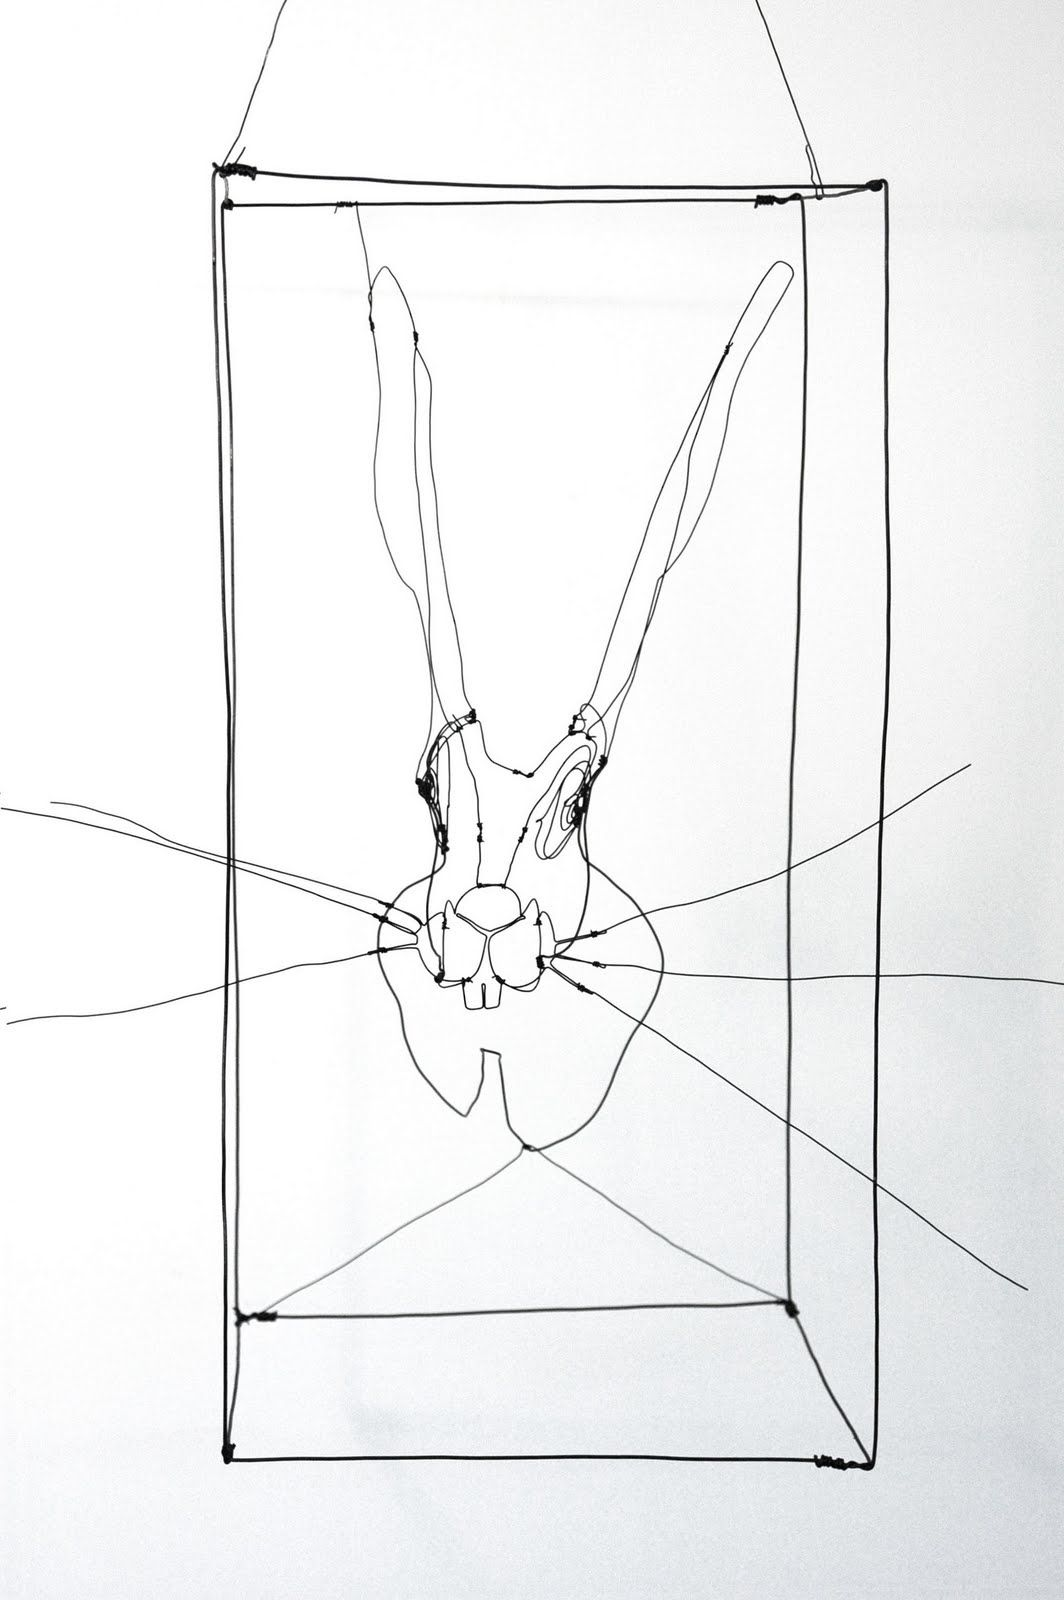 Franck Dorat - ARTAZART | ART: Sculpture | Pinterest | Draht, Metall ...